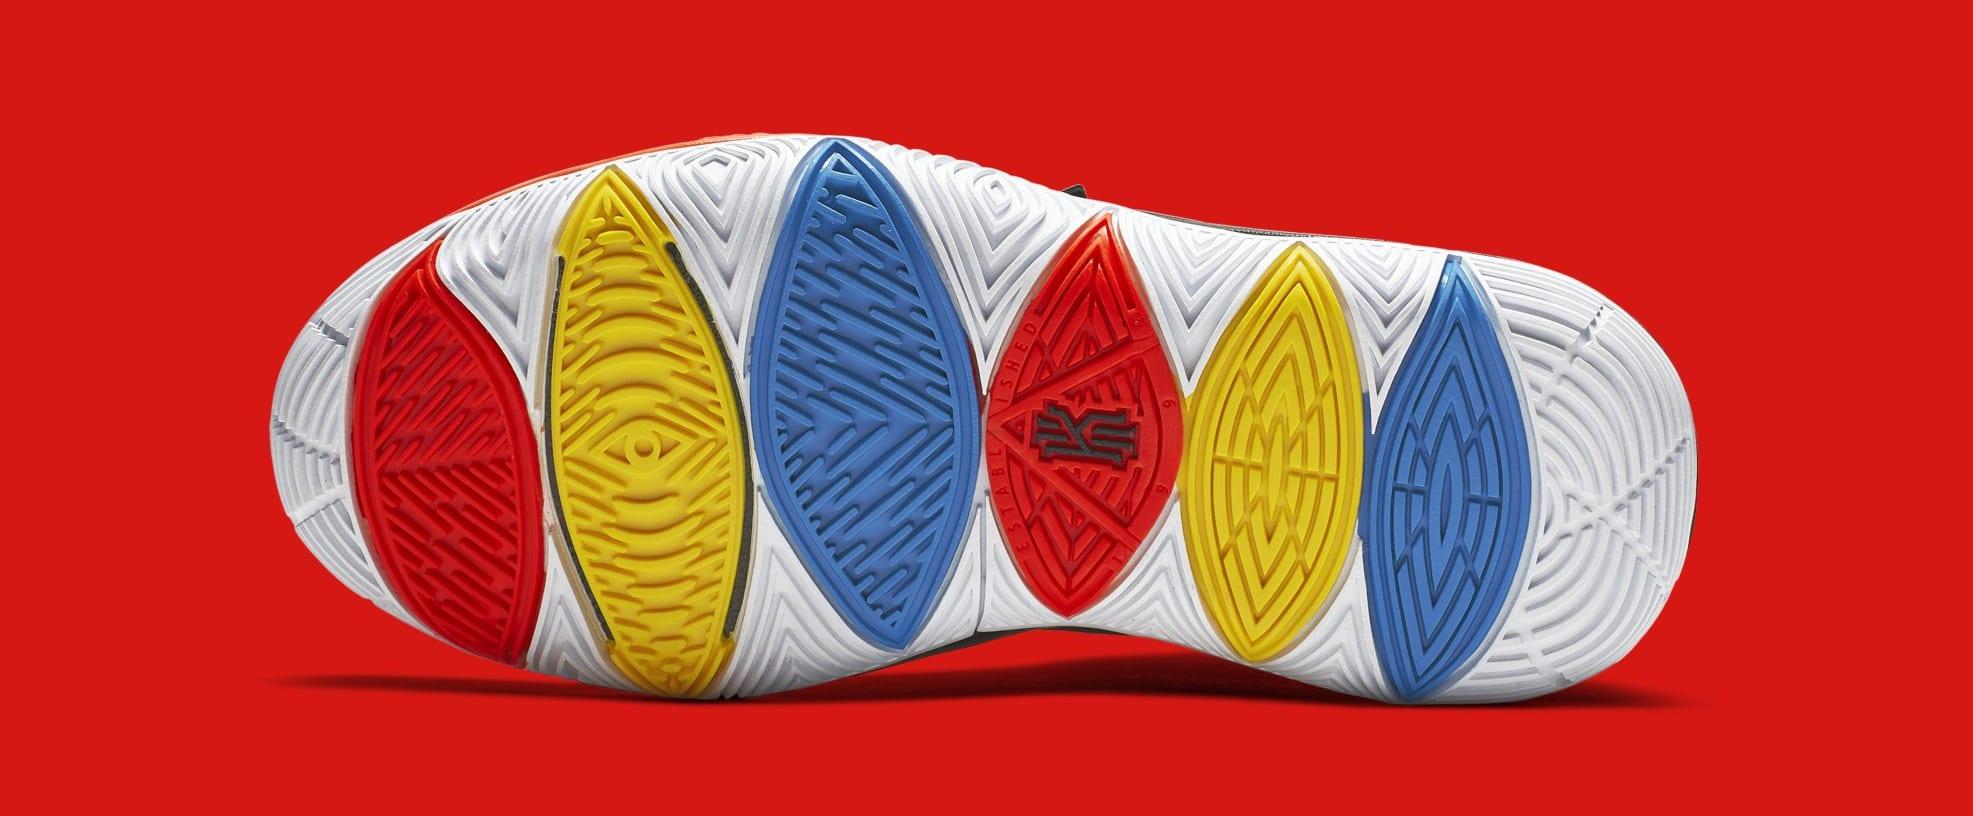 Nike Kyrie 5 'Friends' AQ2456-006 (Bottom)